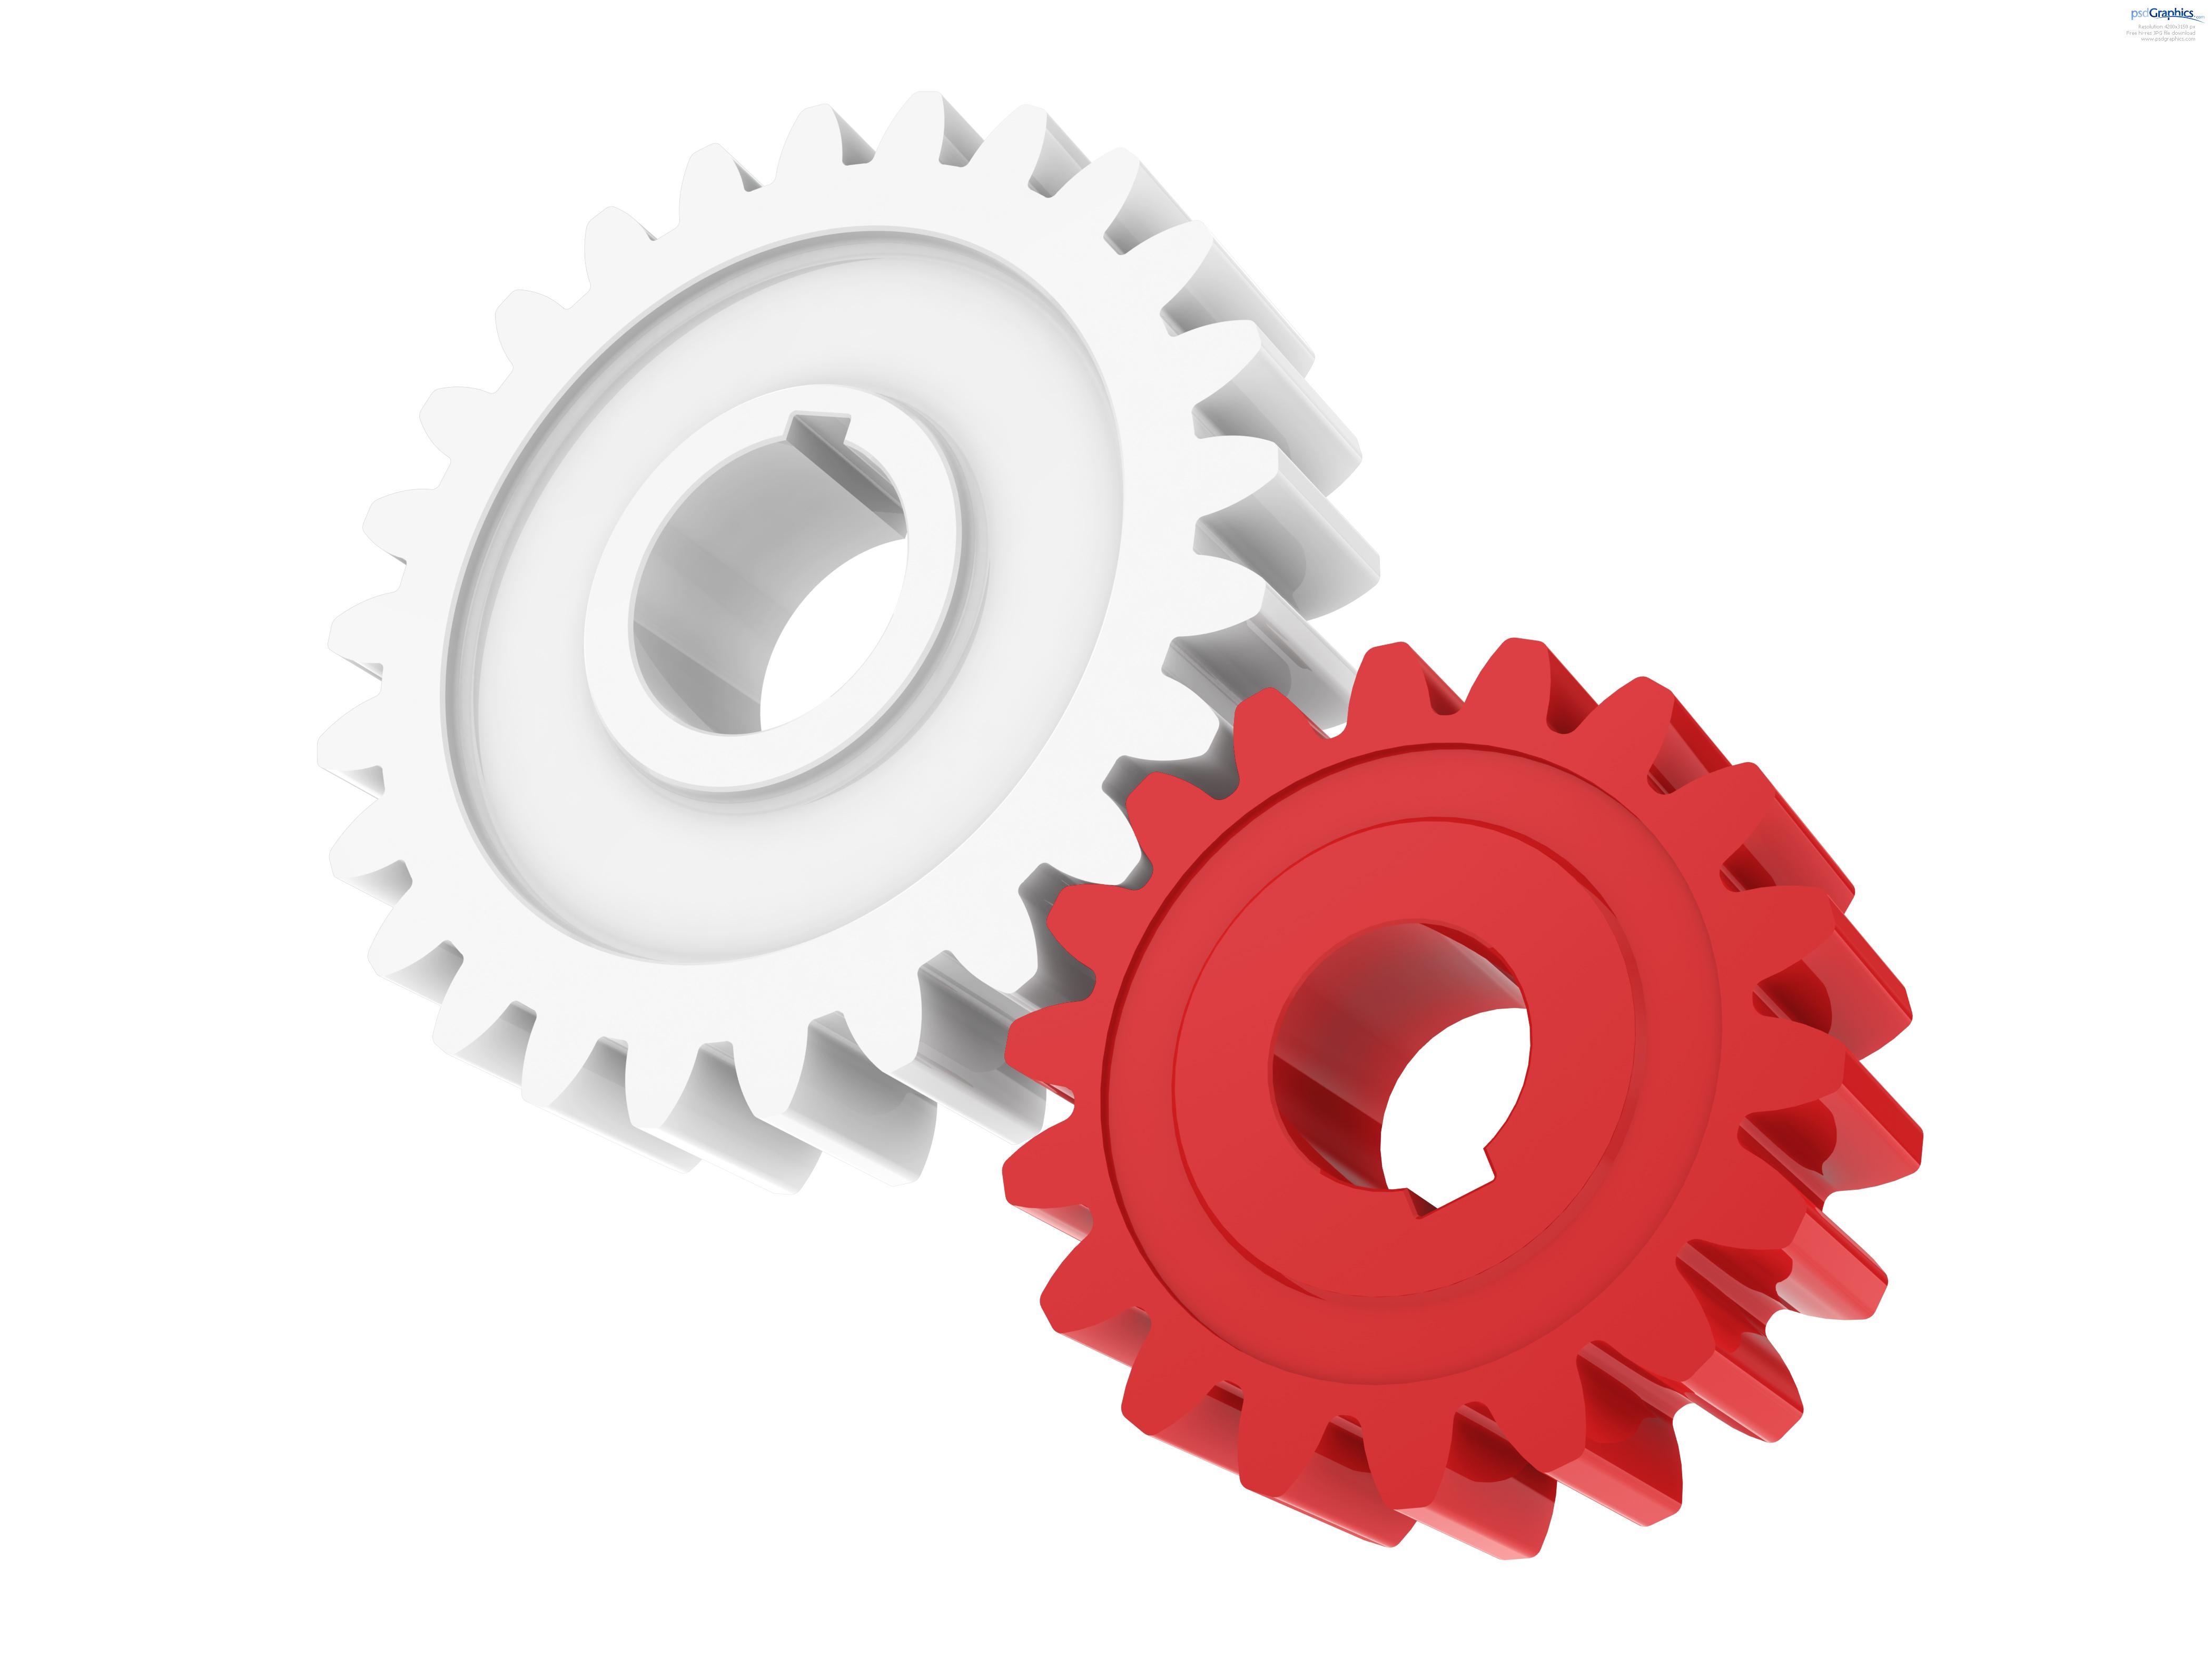 Gears clipart 3d gear Plastic Plastic of success gears